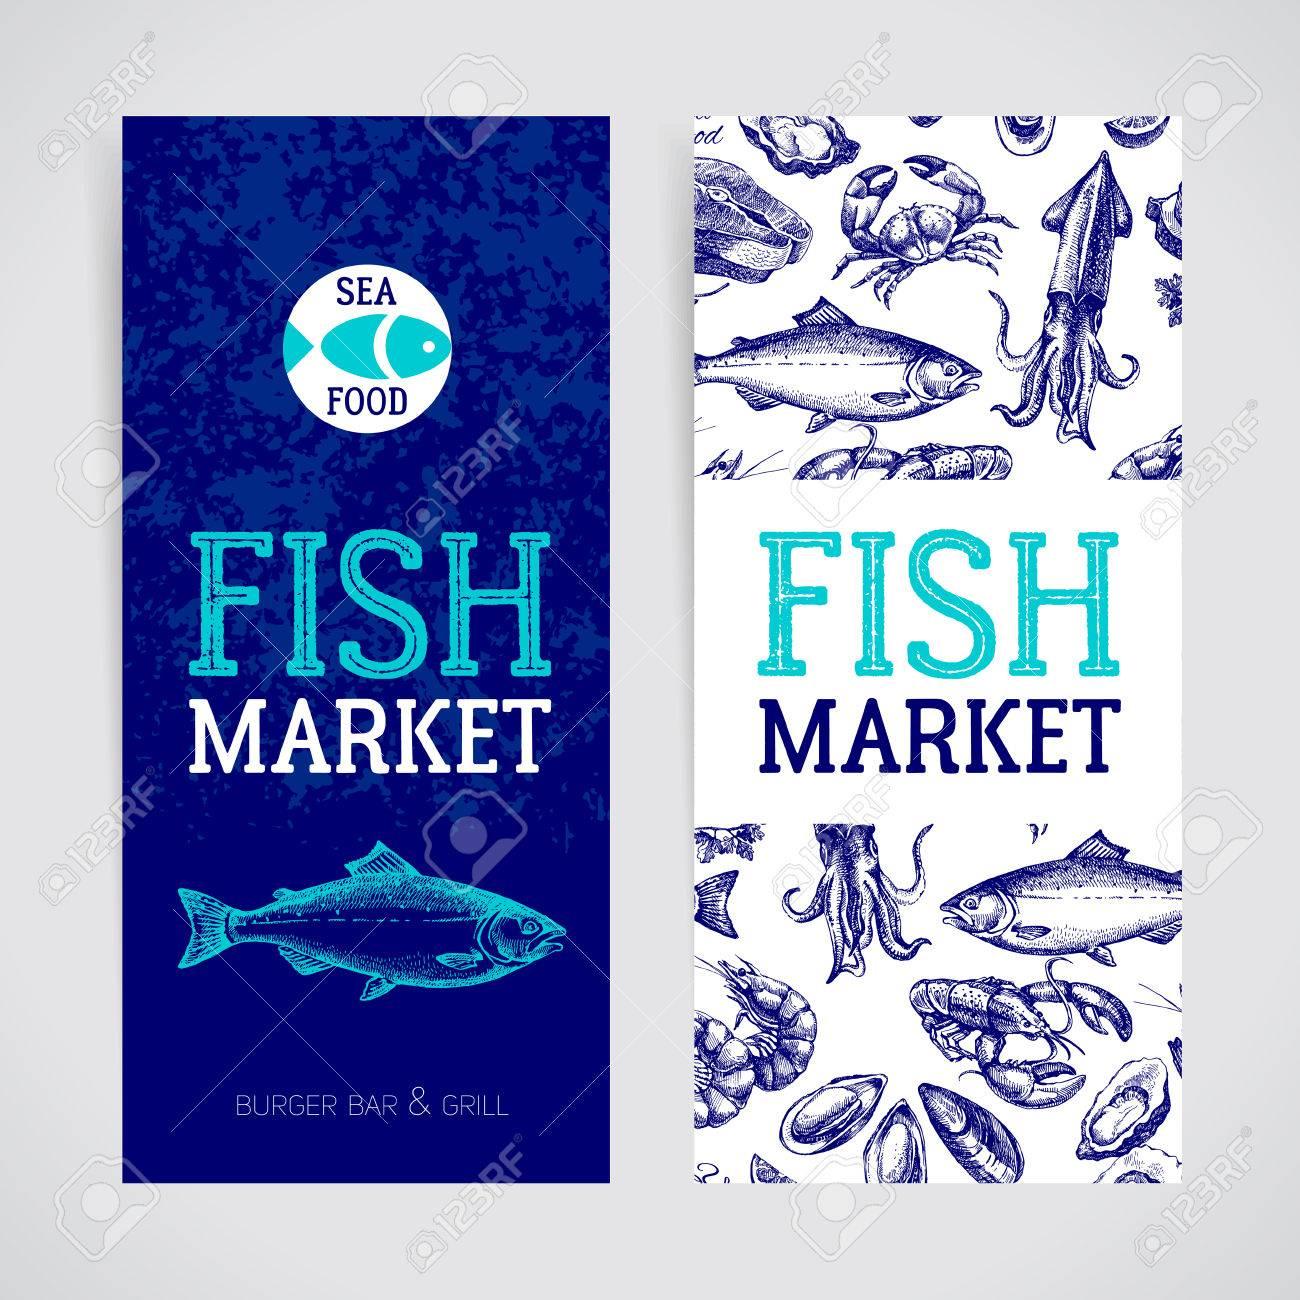 Restaurant Fresh Sea Food Menu Banners Set Fish Market Pakage And Poster